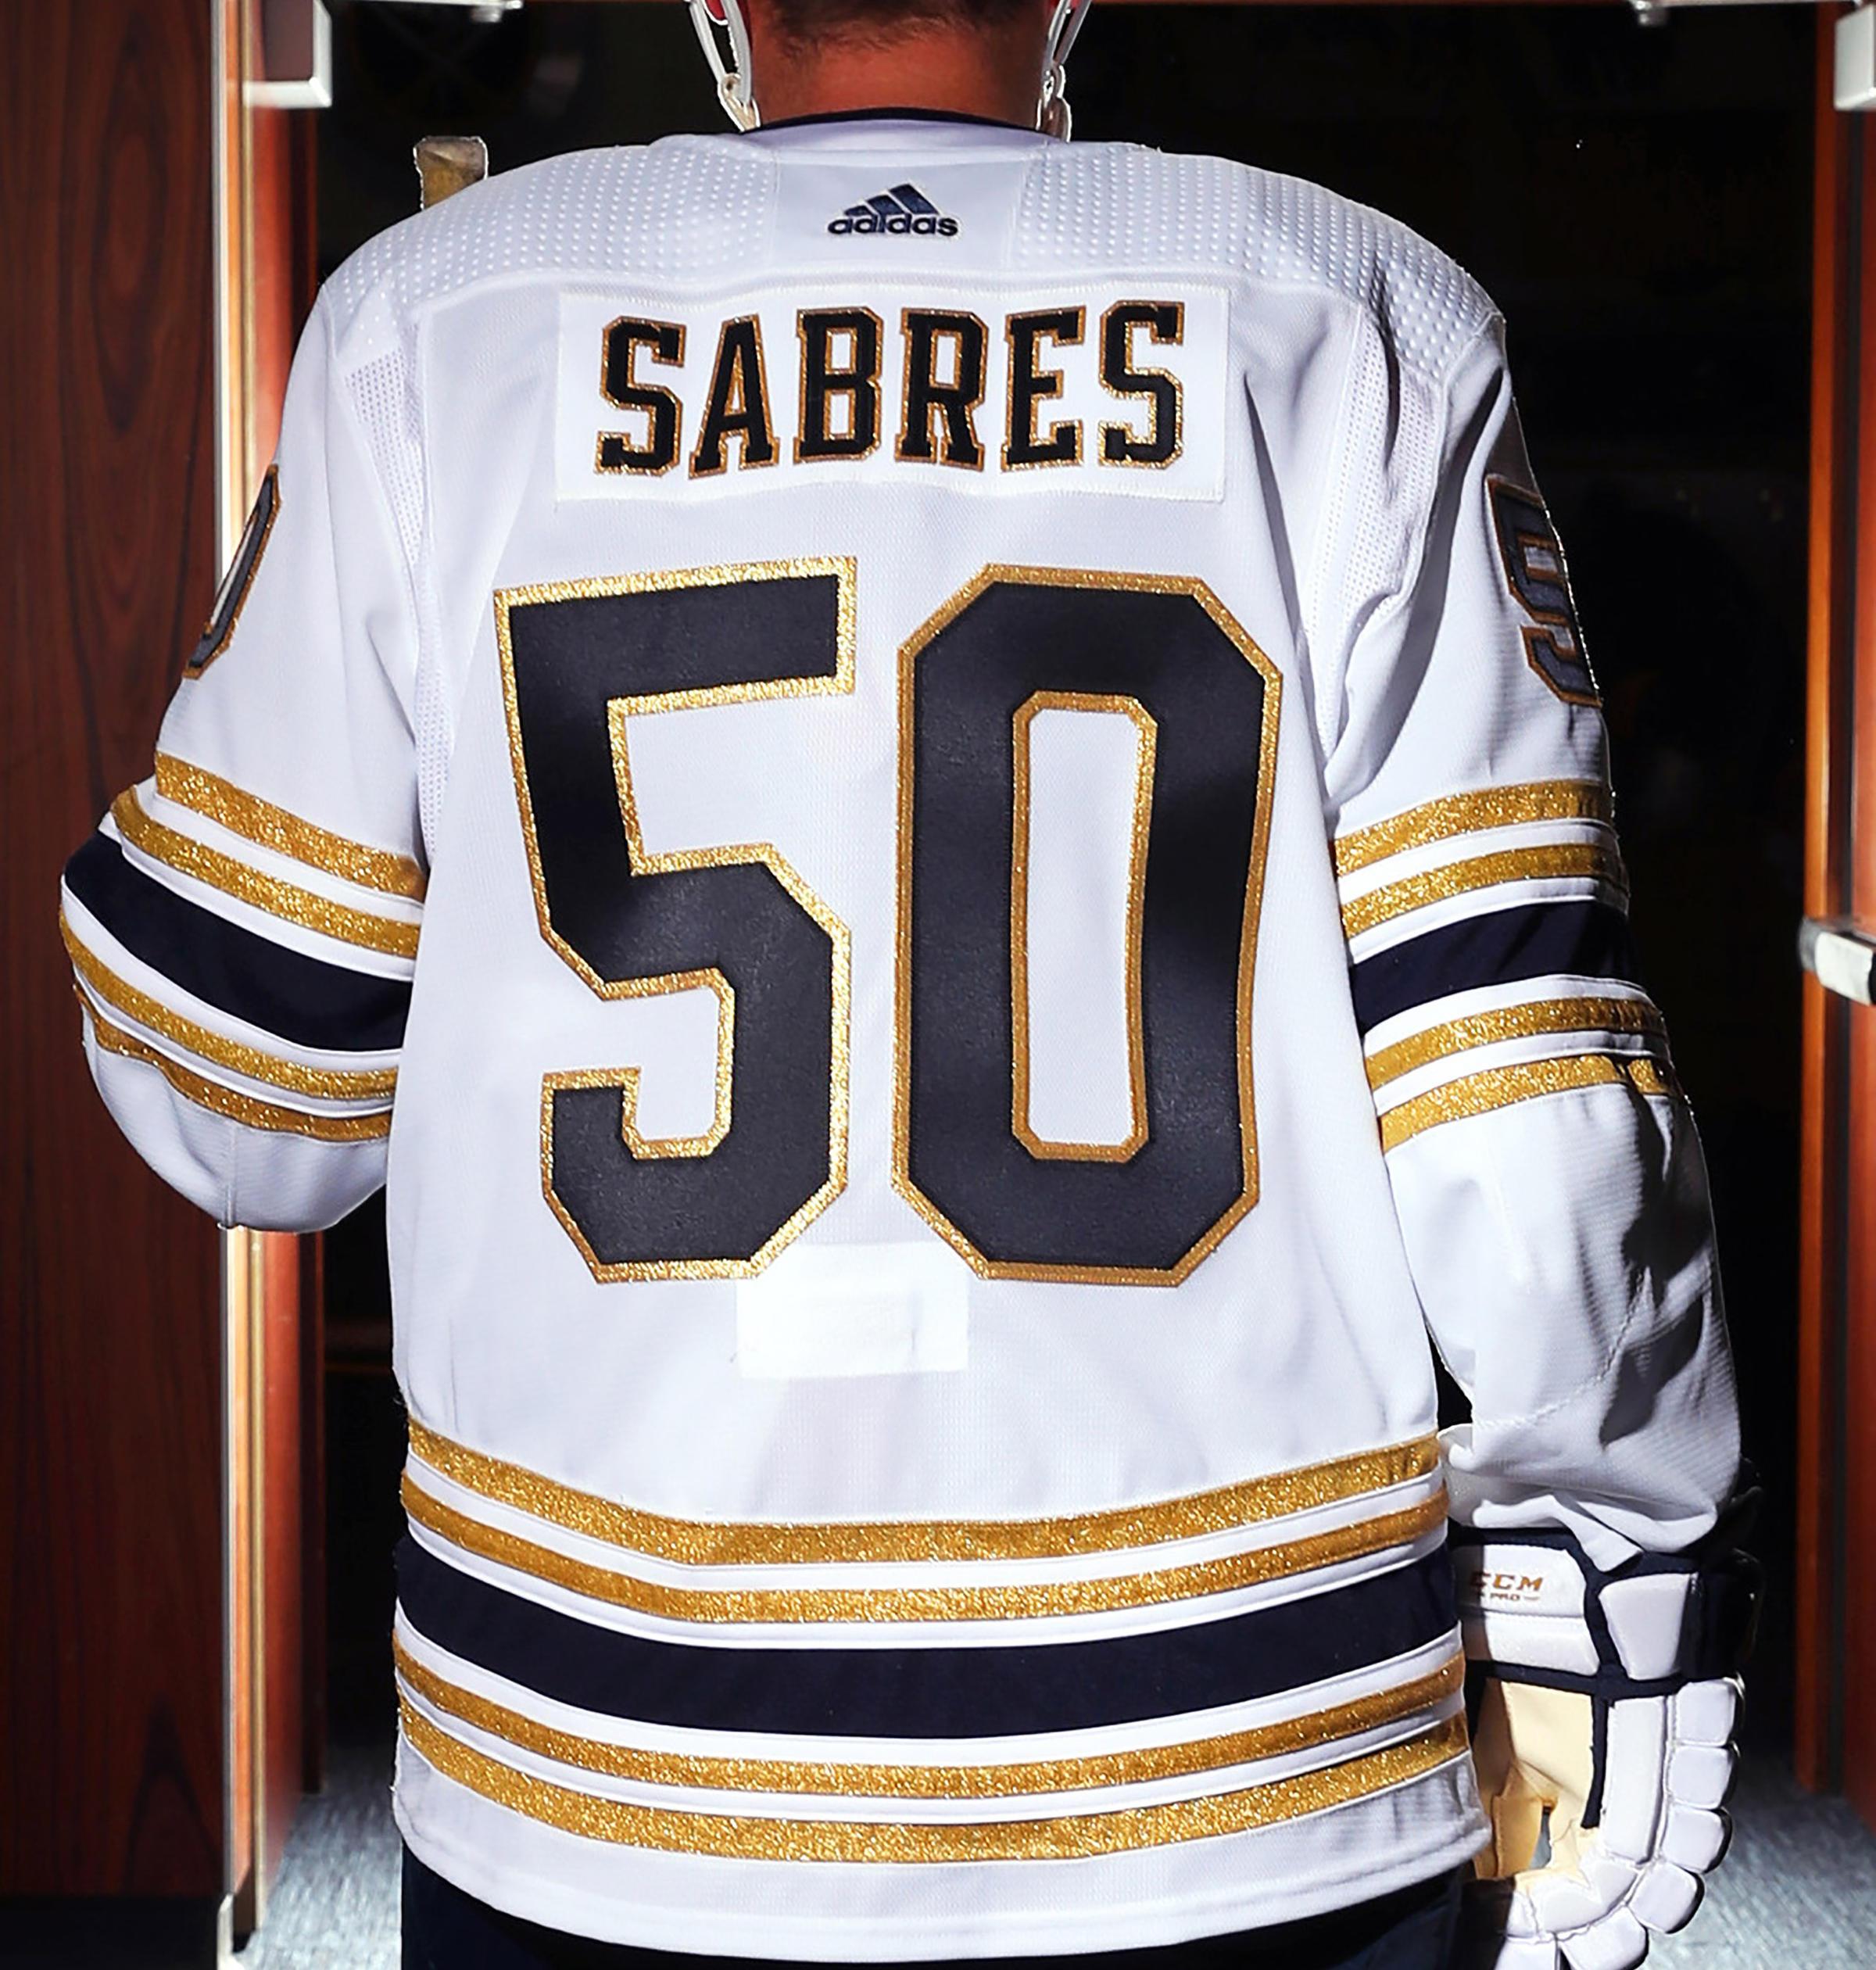 premium selection 26776 e6011 Sabres unveil 50th anniversary Golden Jersey | WBFO